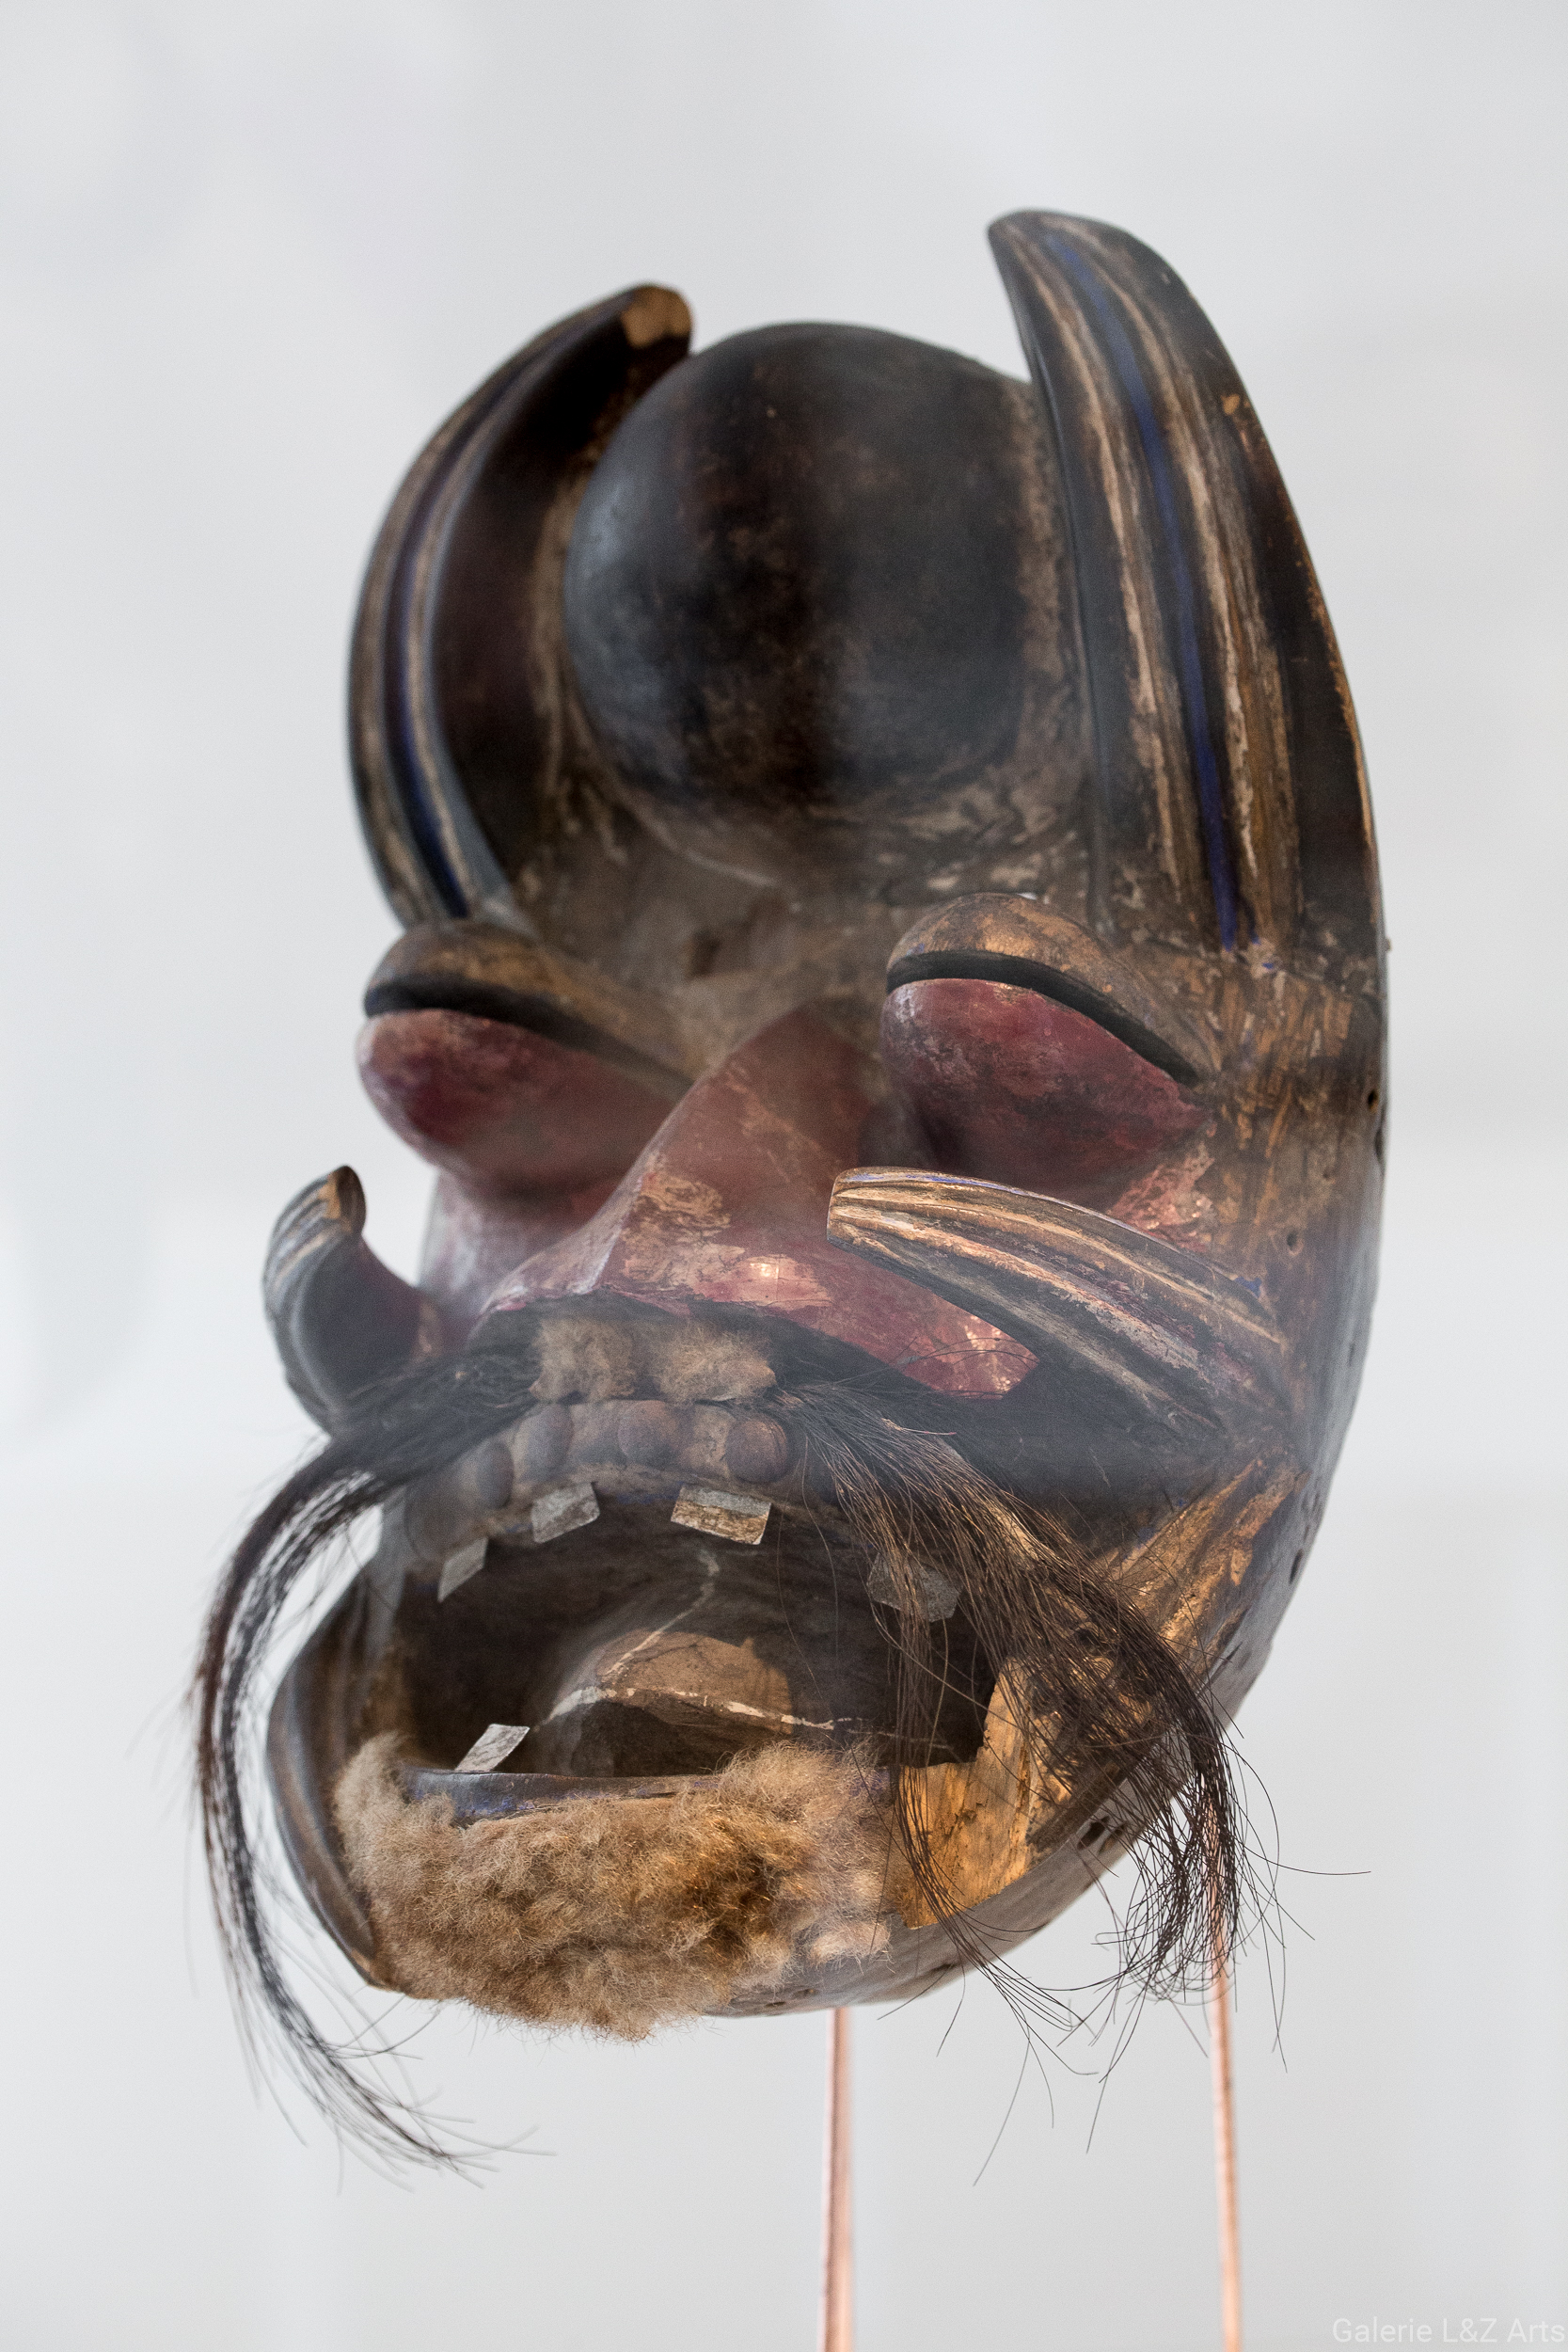 tribal-art-oostende-ostende-exposition-galerie-lz-art-africain-belgique-3.jpg